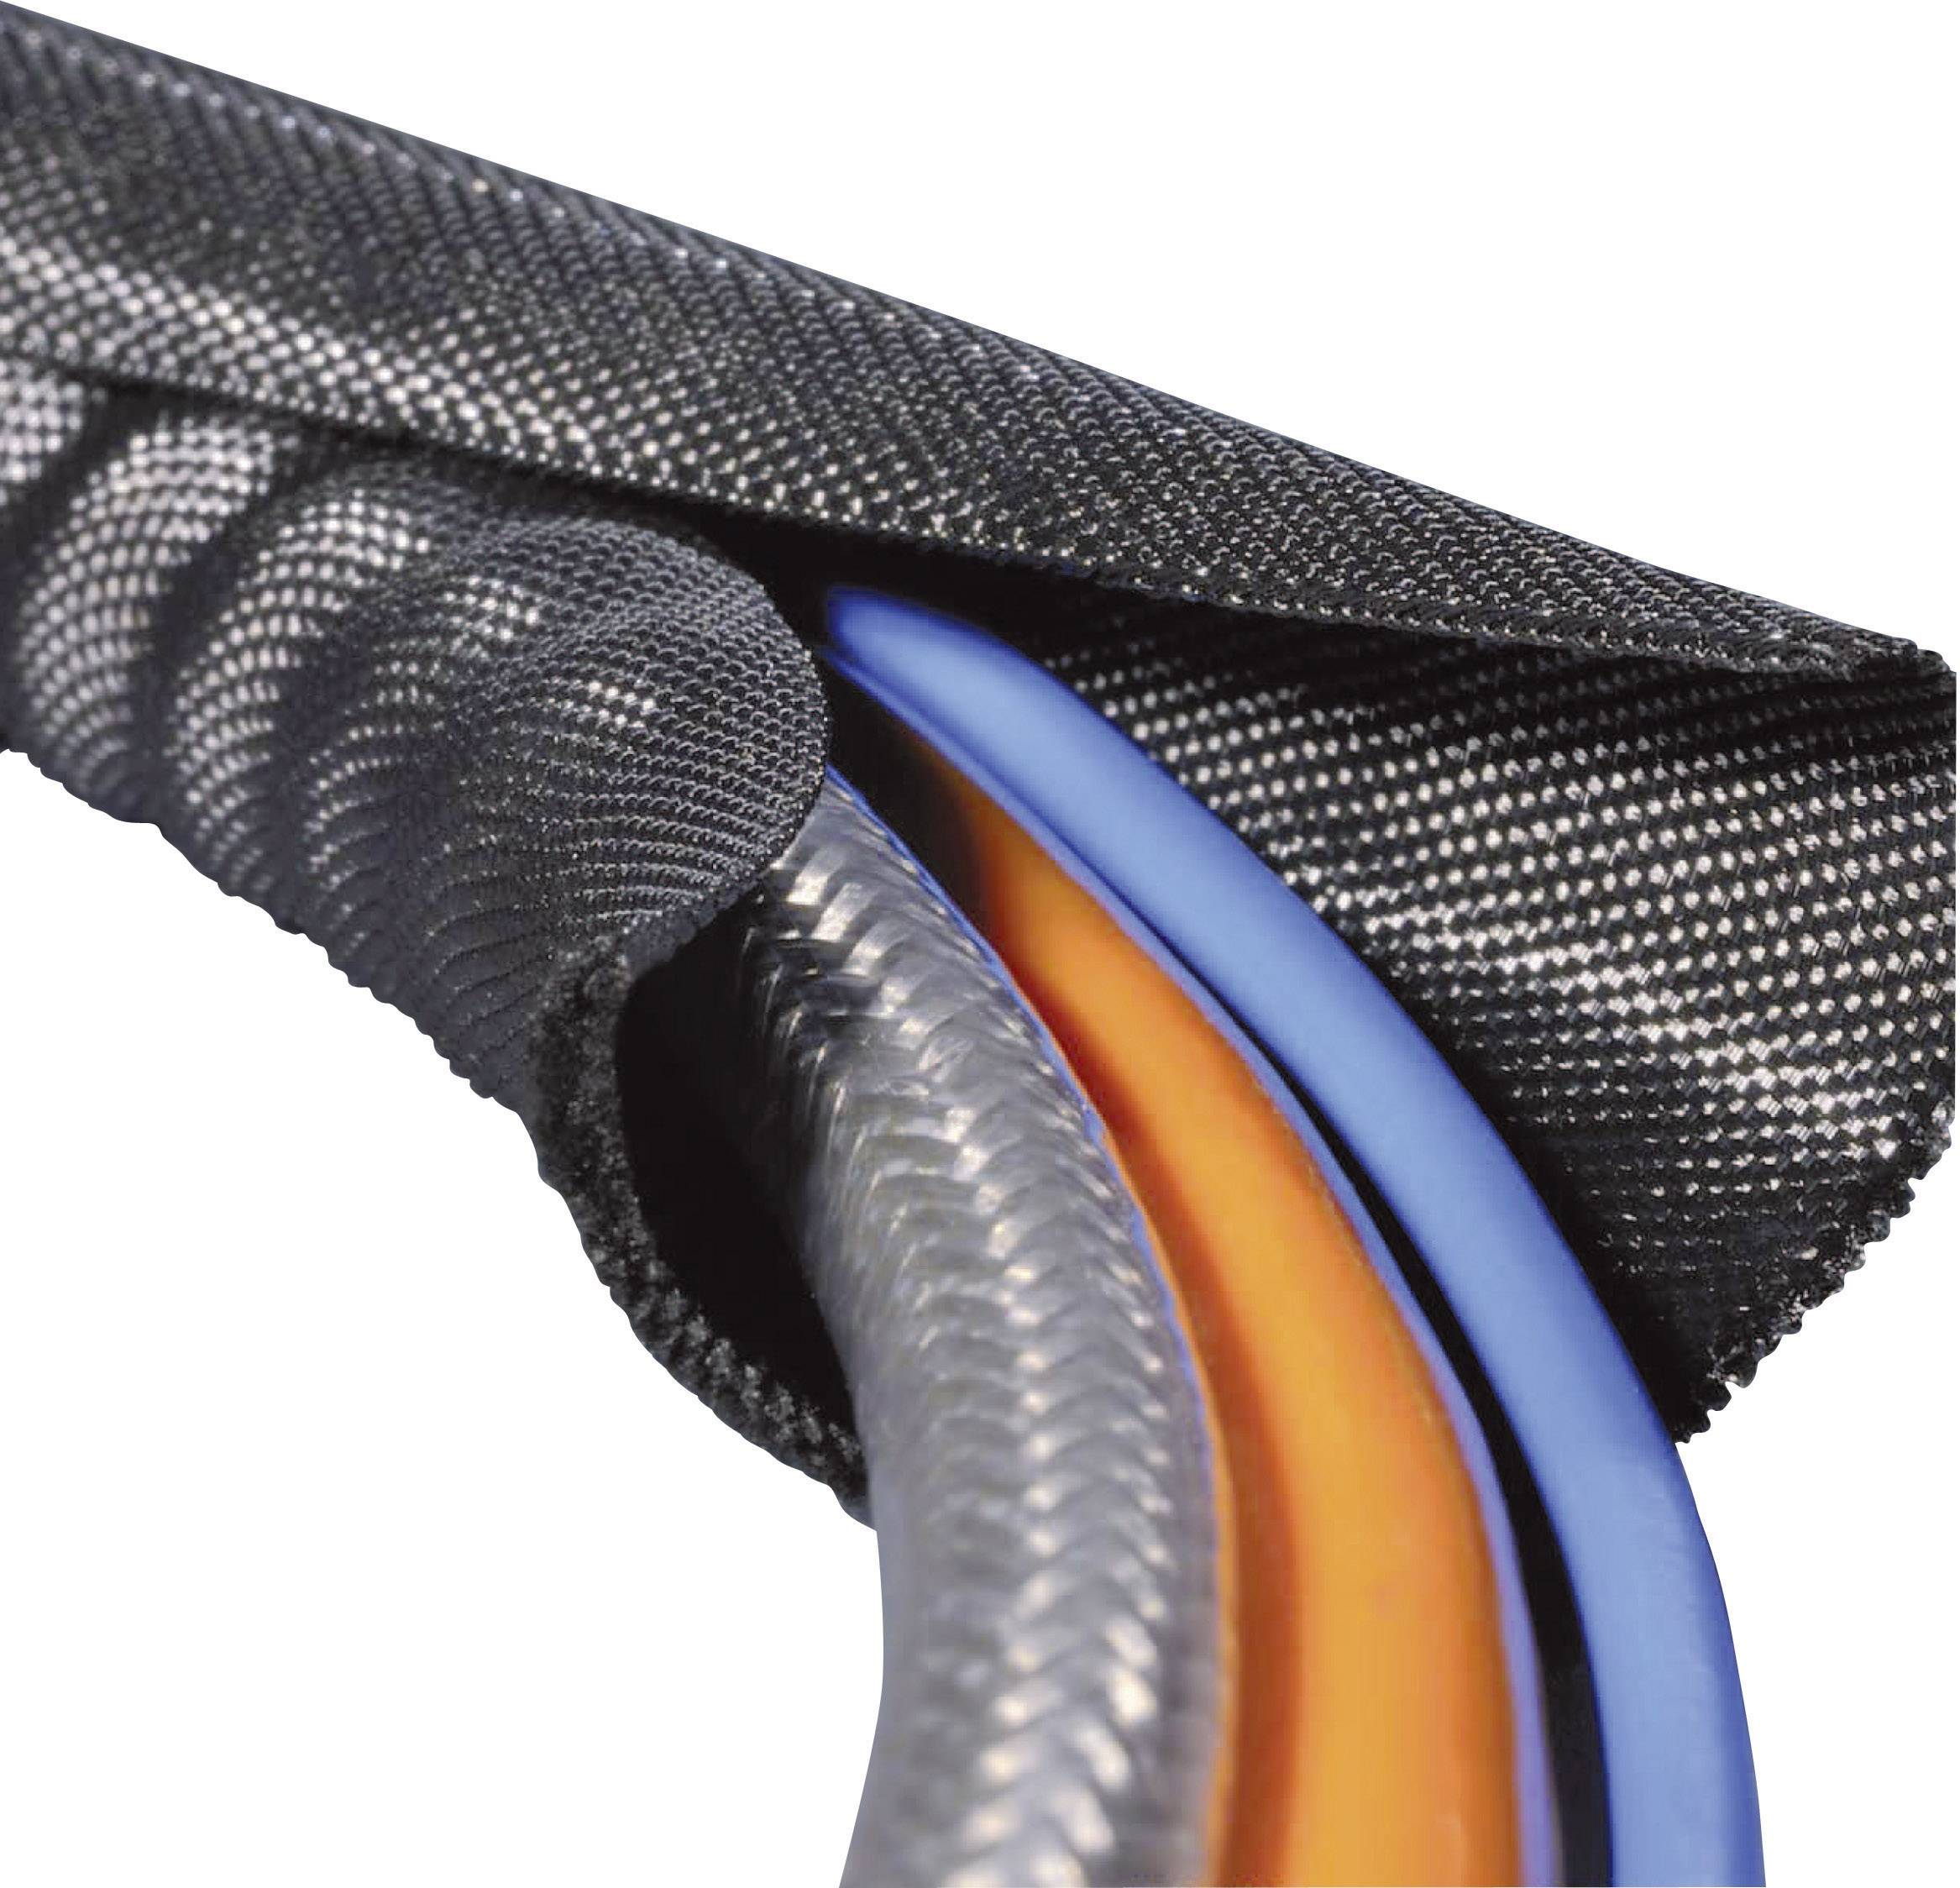 Ochranný oplet HellermannTyton Twist-In 05, 4 do 5 mm, -70 do +125 °C, metrový tovar, čierna